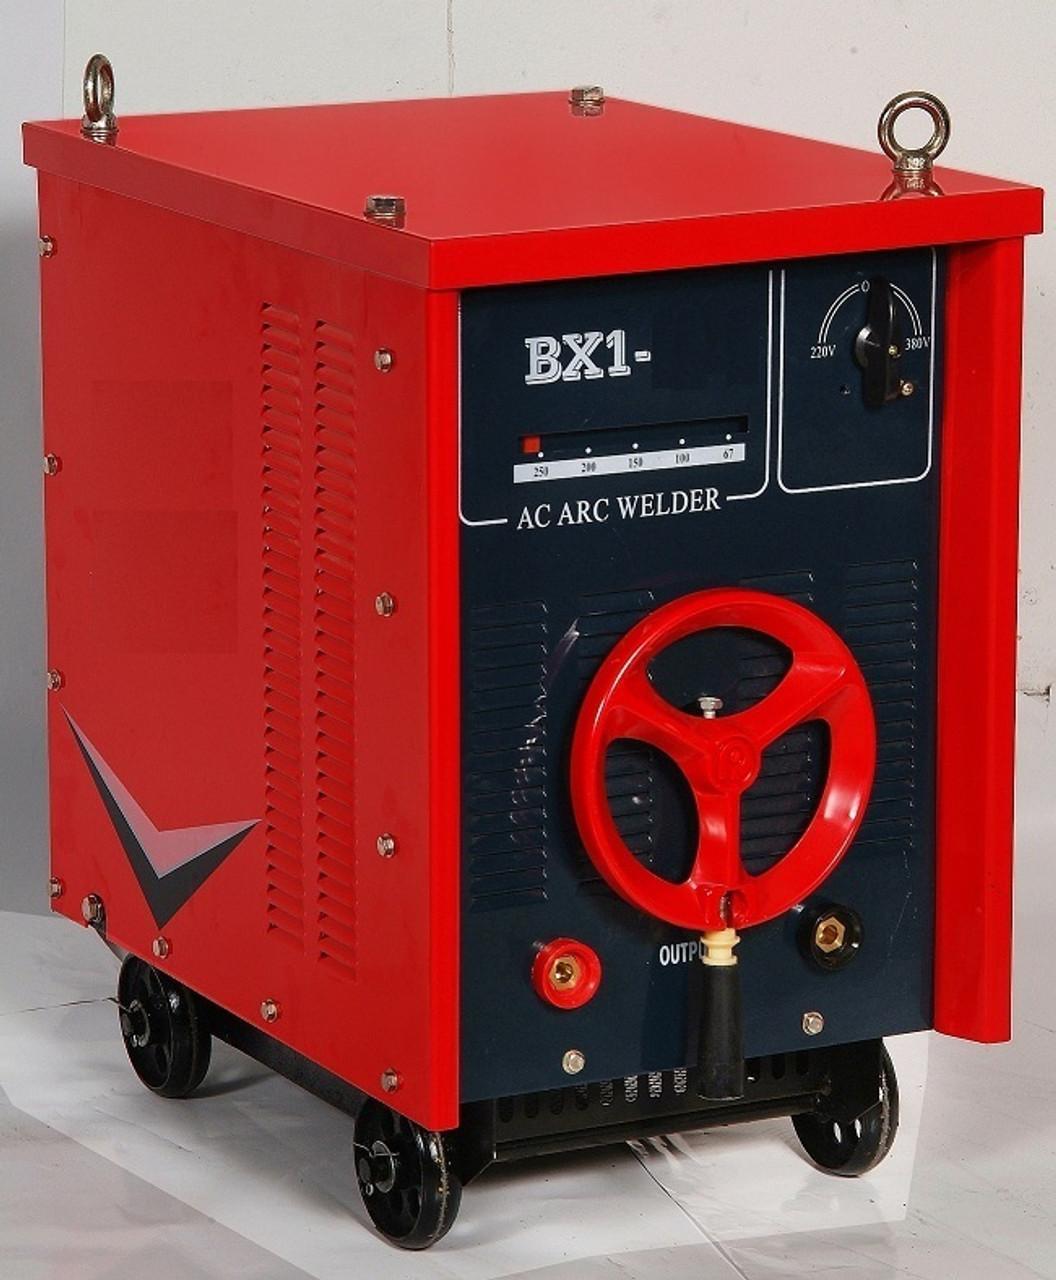 Buy Power Flex Welding Machine Single Phase 400 Amps Ac Arc Welder At Gz Nigeria